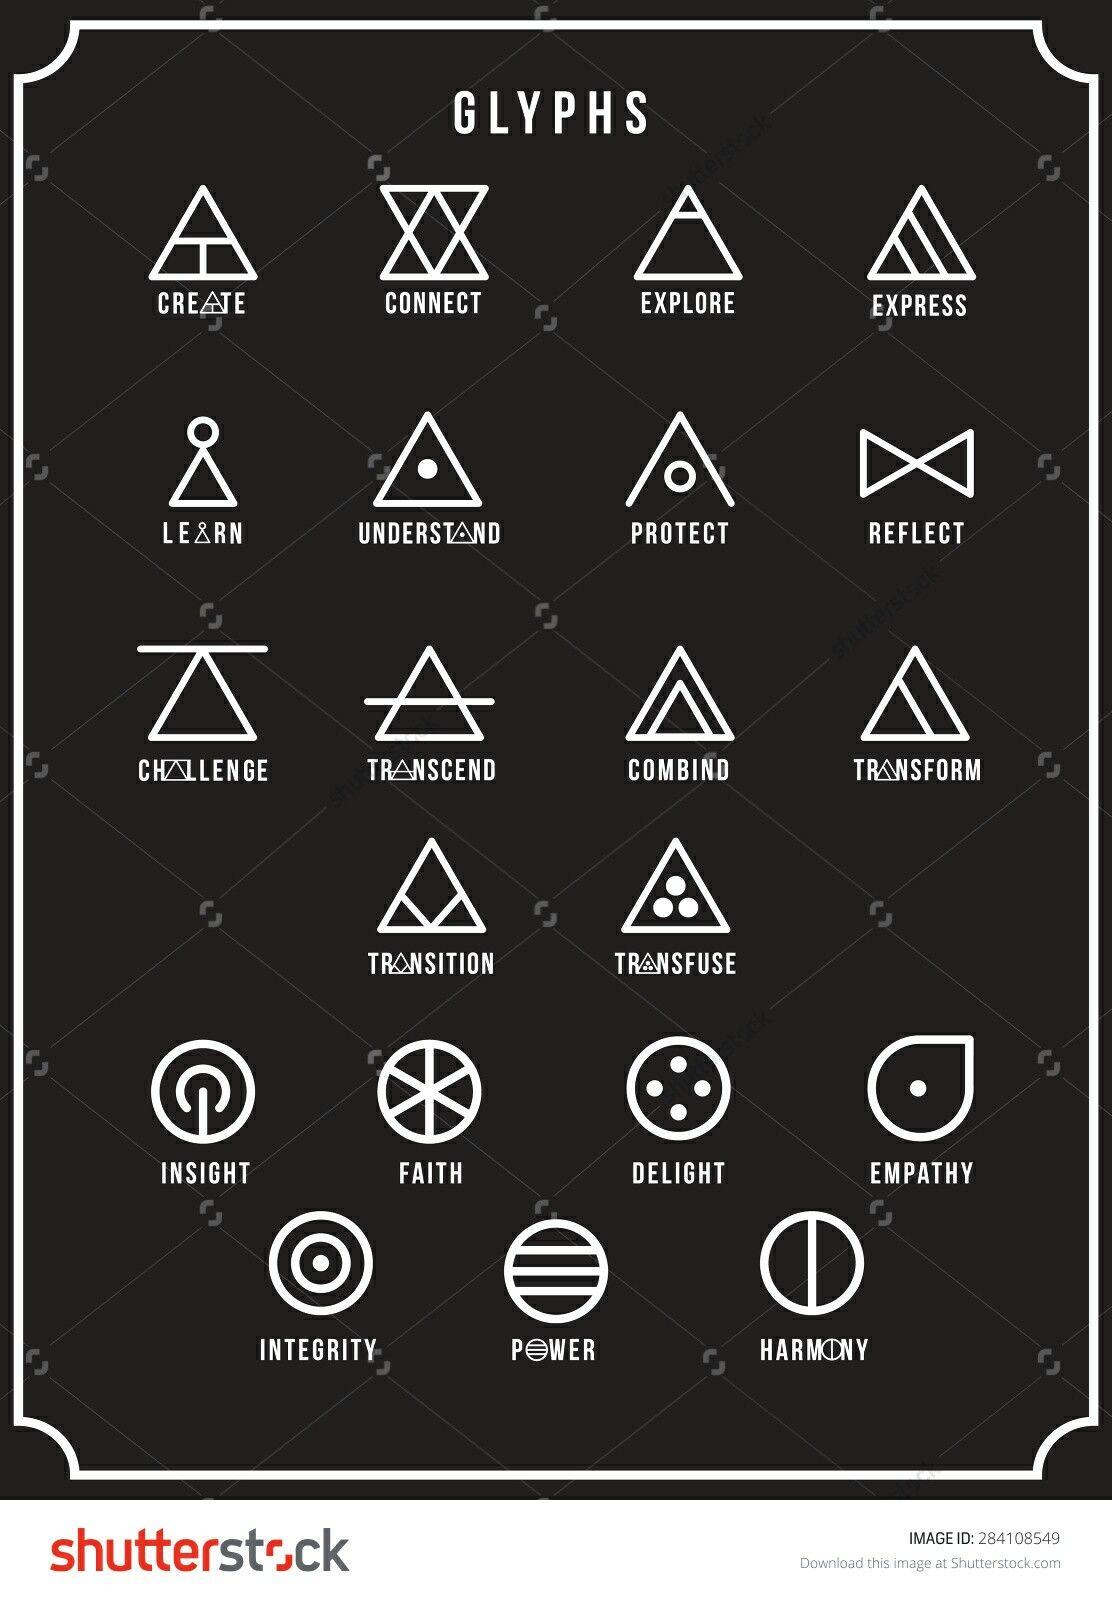 Small spiritual tattoo ideas pin by brenda merc on lápiz  pinterest  tattoos symbols and glyphs